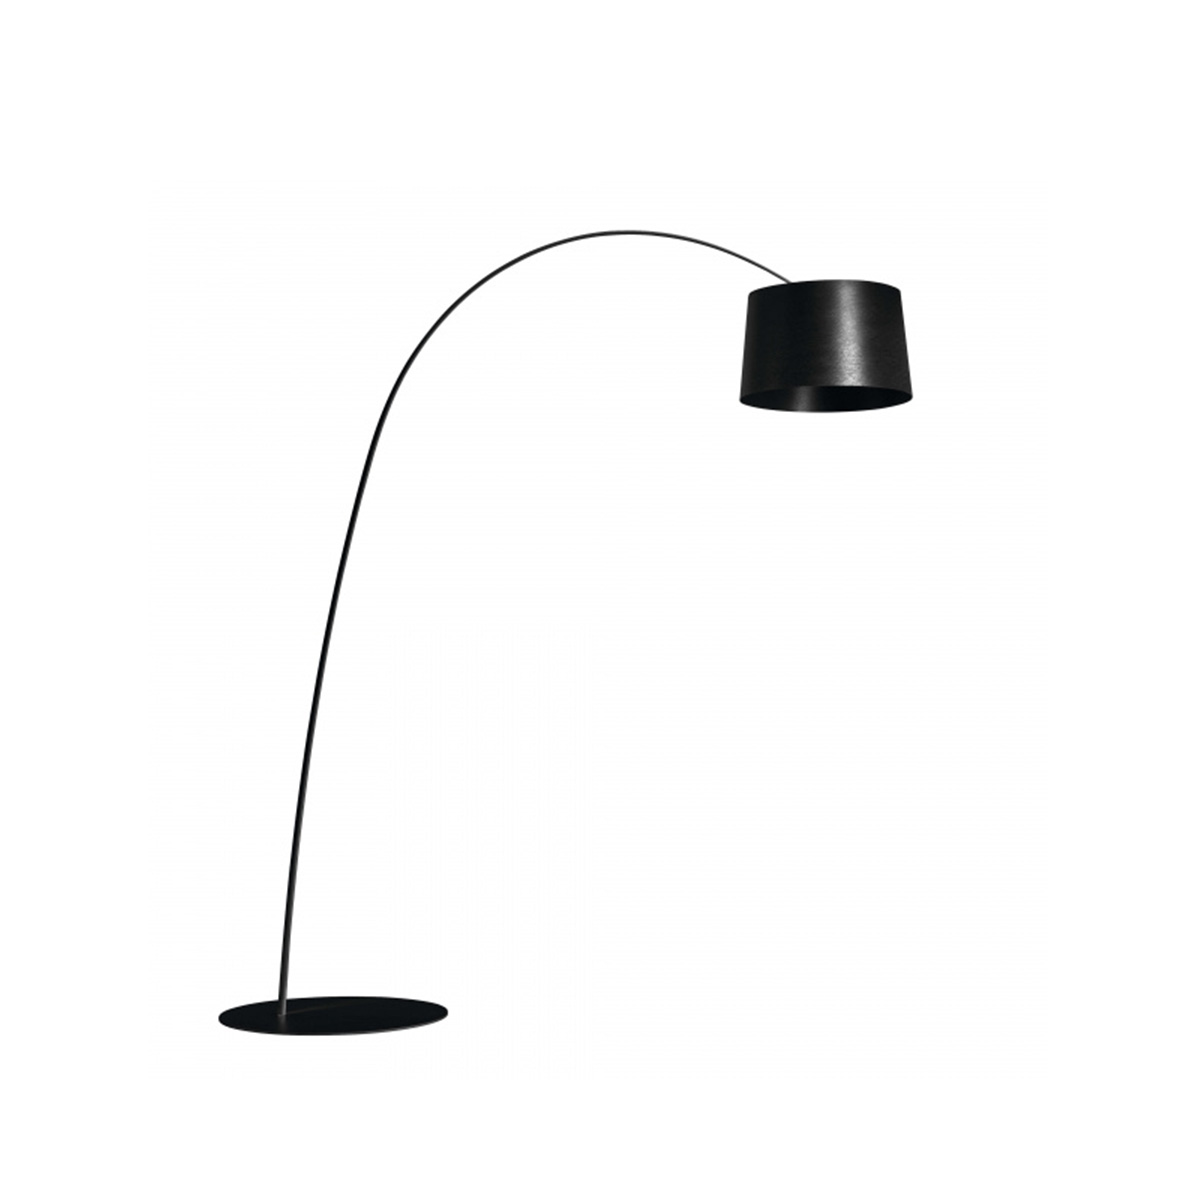 Podna lampa TWIGGY 159003 20 crna